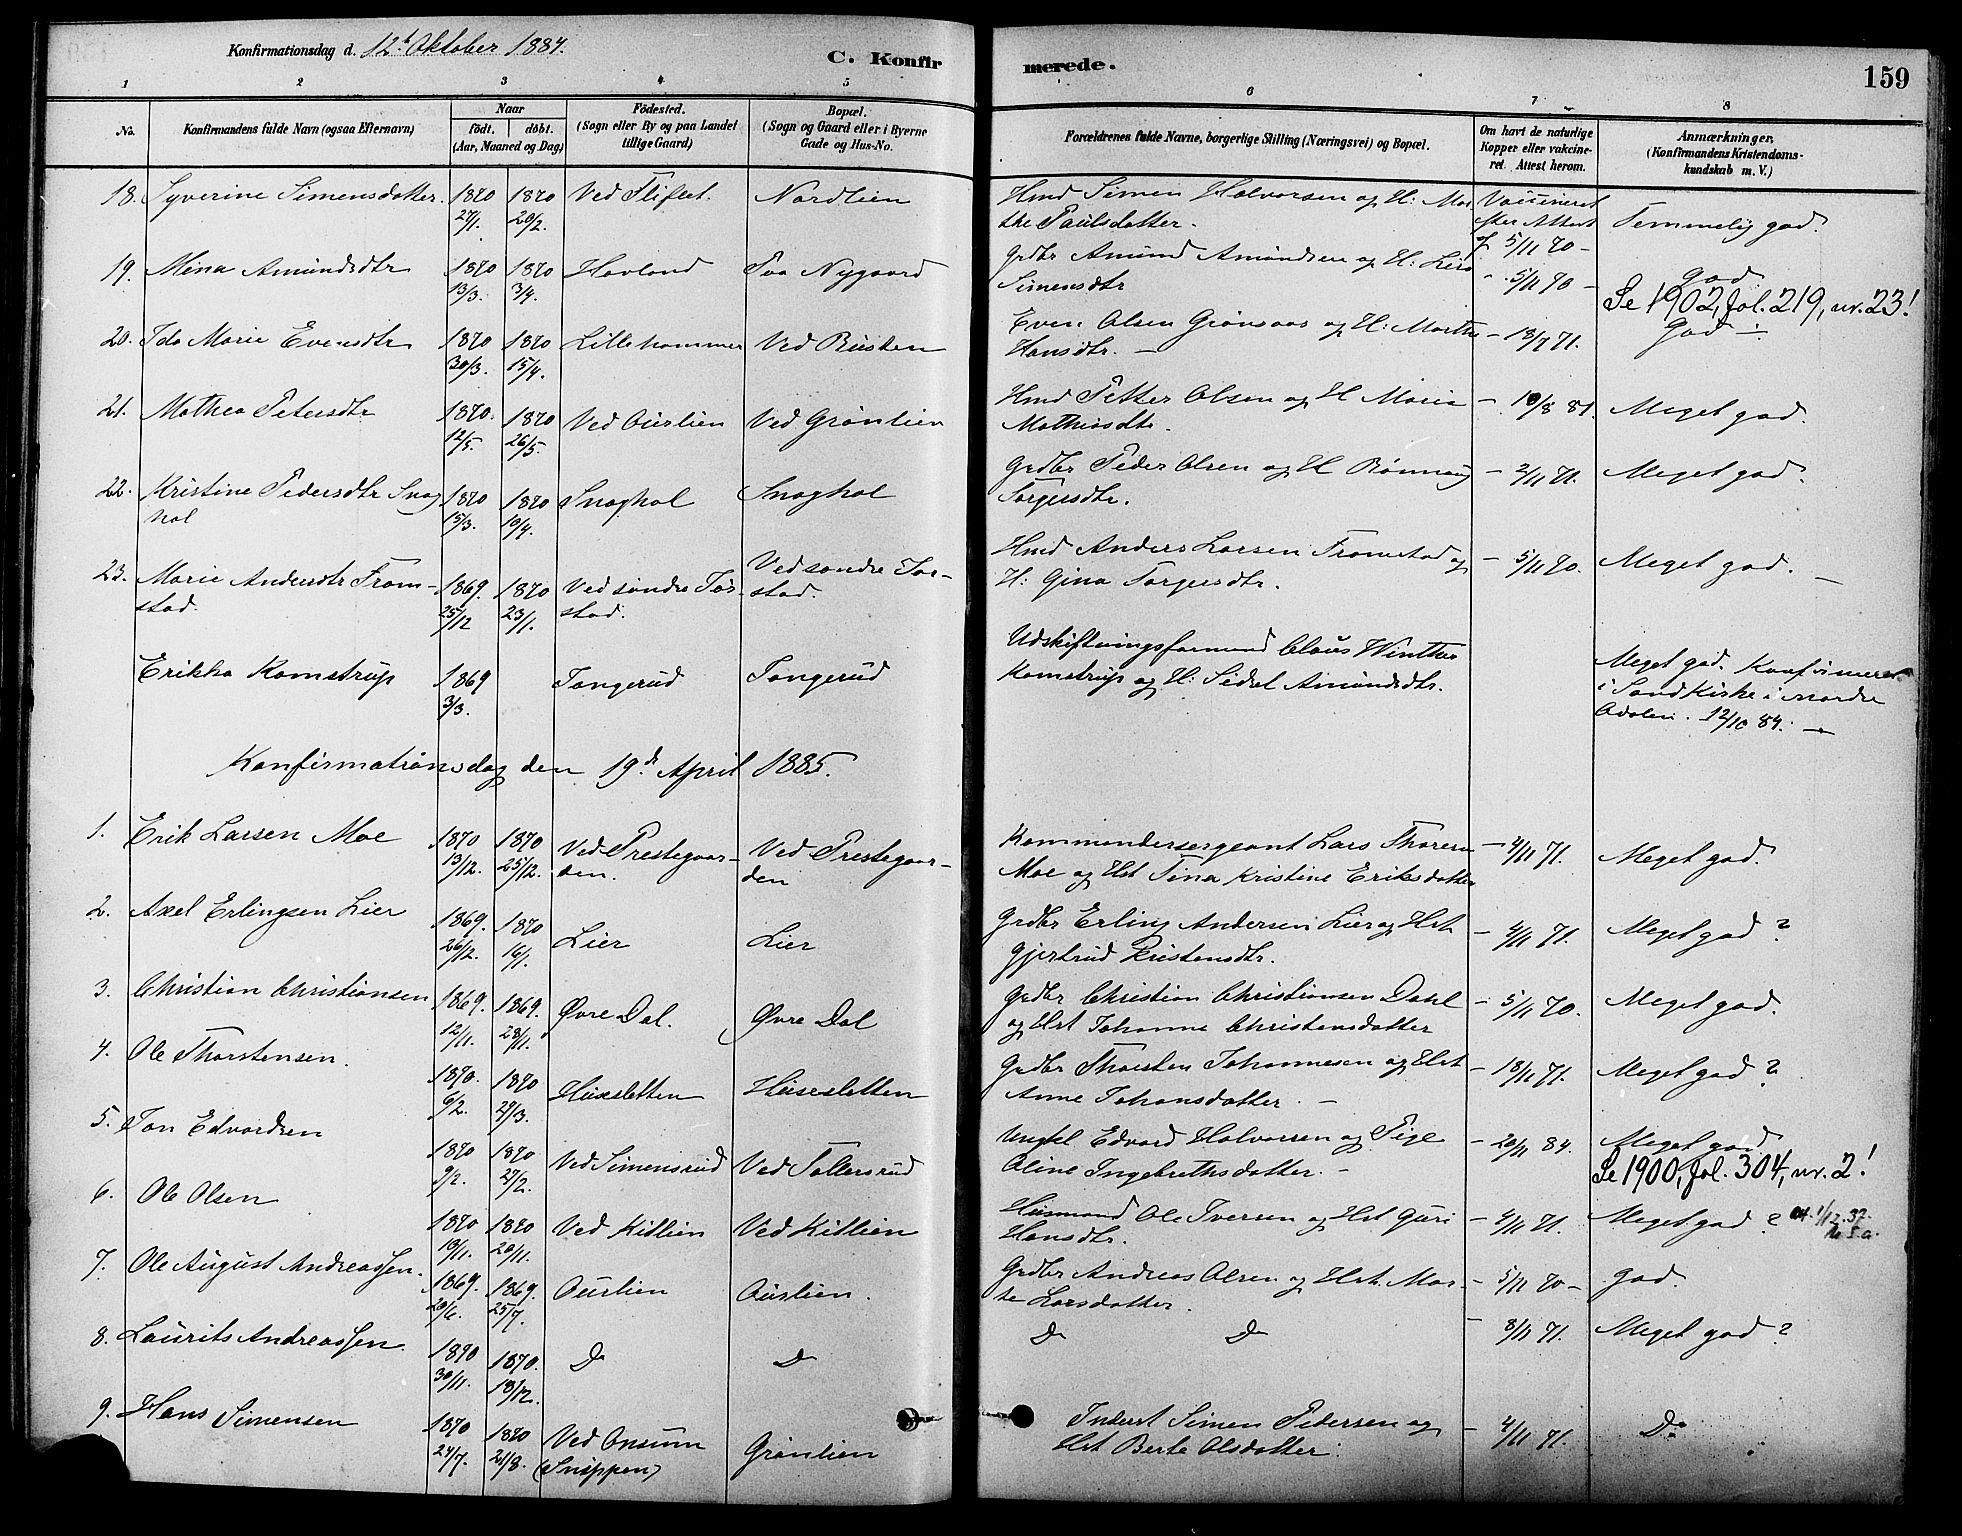 SAH, Fåberg prestekontor, Ministerialbok nr. 8, 1879-1898, s. 159